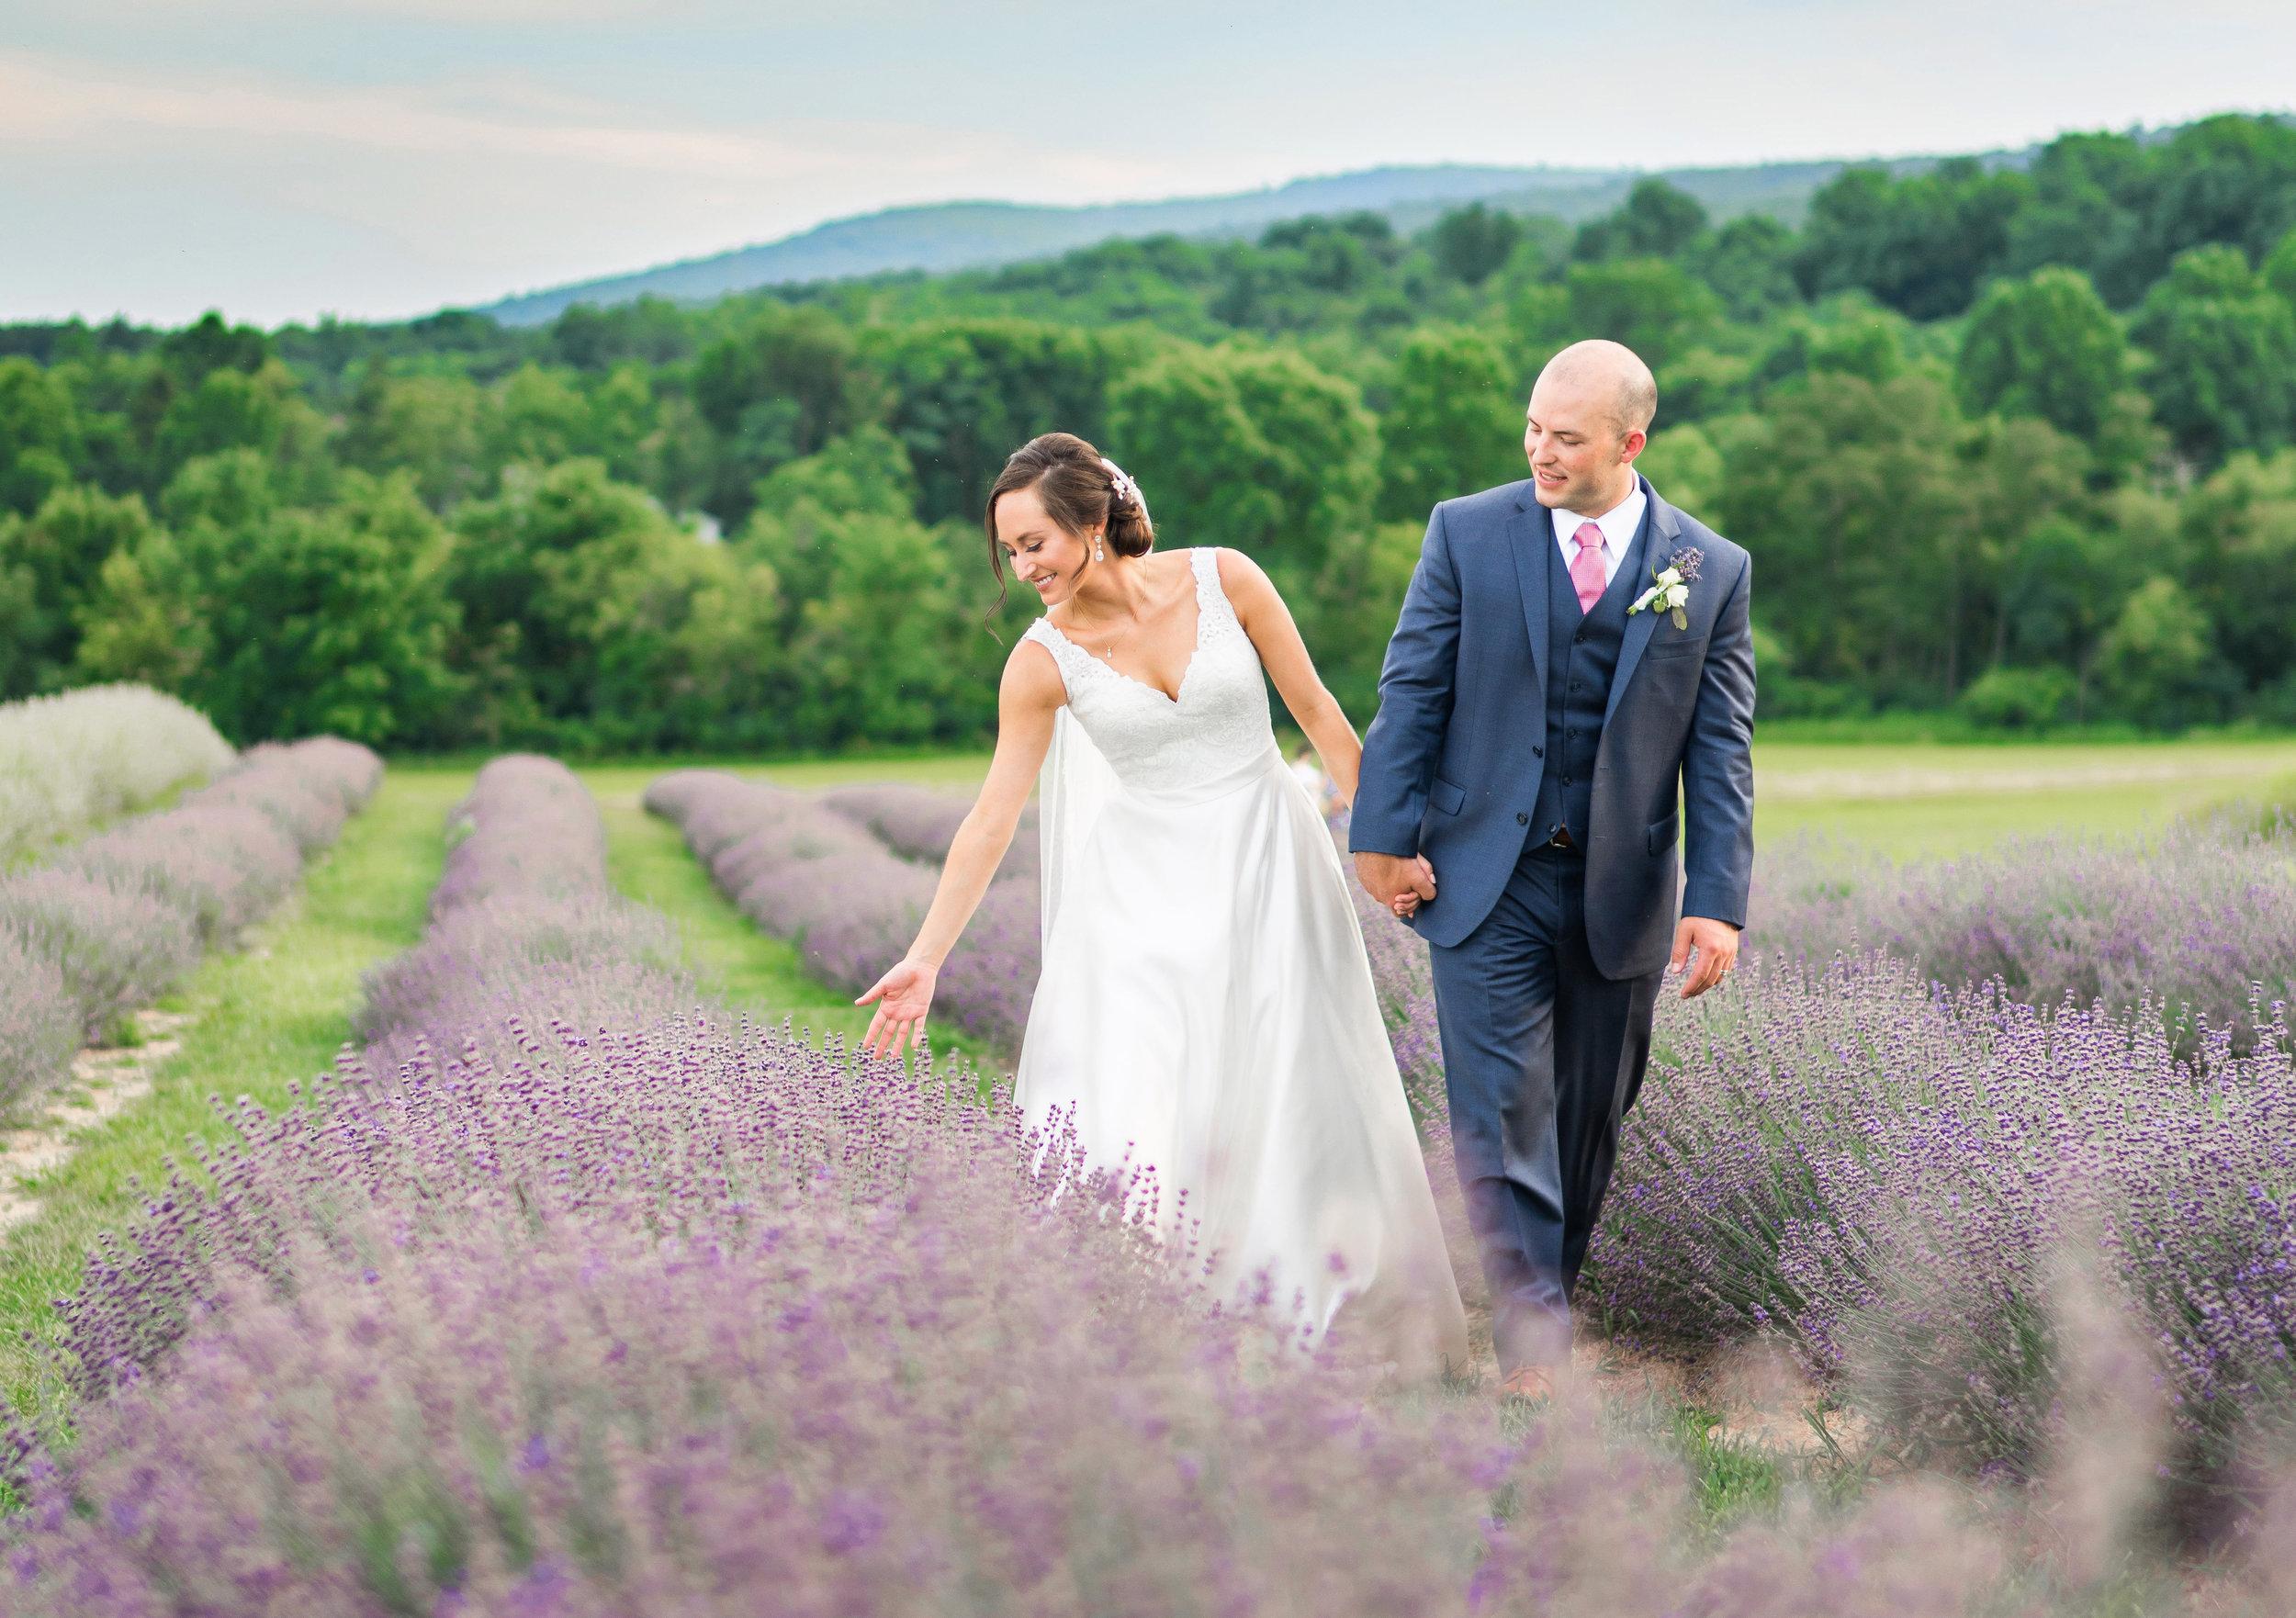 Lavender vineyard wedding at Springfield Manor by Jessica Nazarova